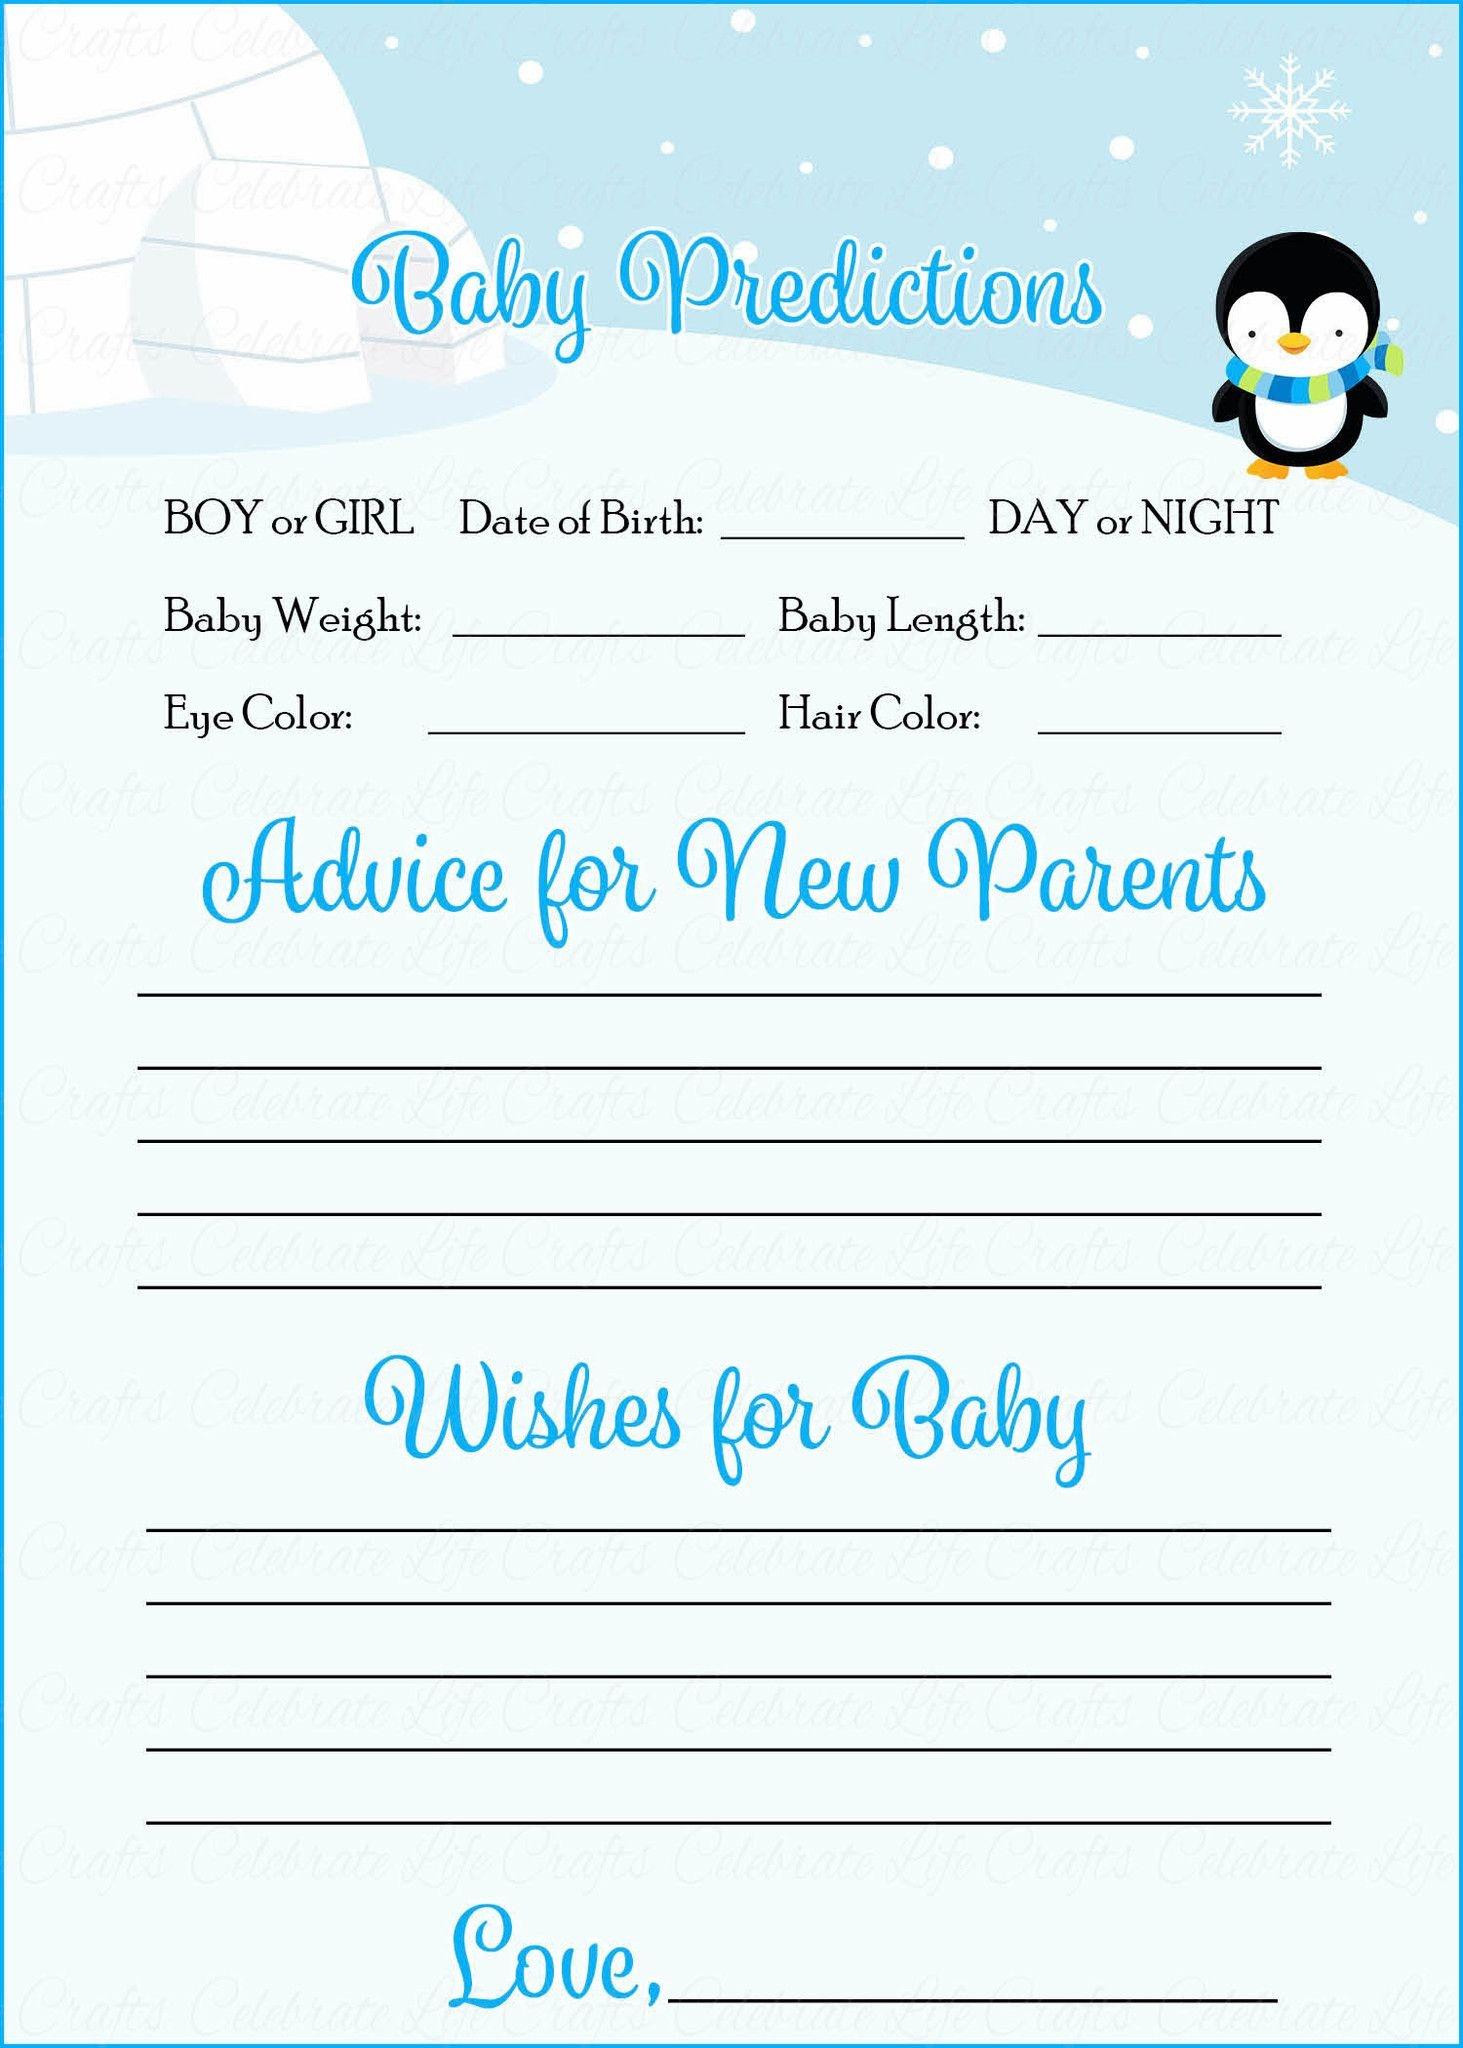 Prediction & Advice Cards - Printable Download - Blue Penguin Winter - Baby Prediction And Advice Cards Free Printable